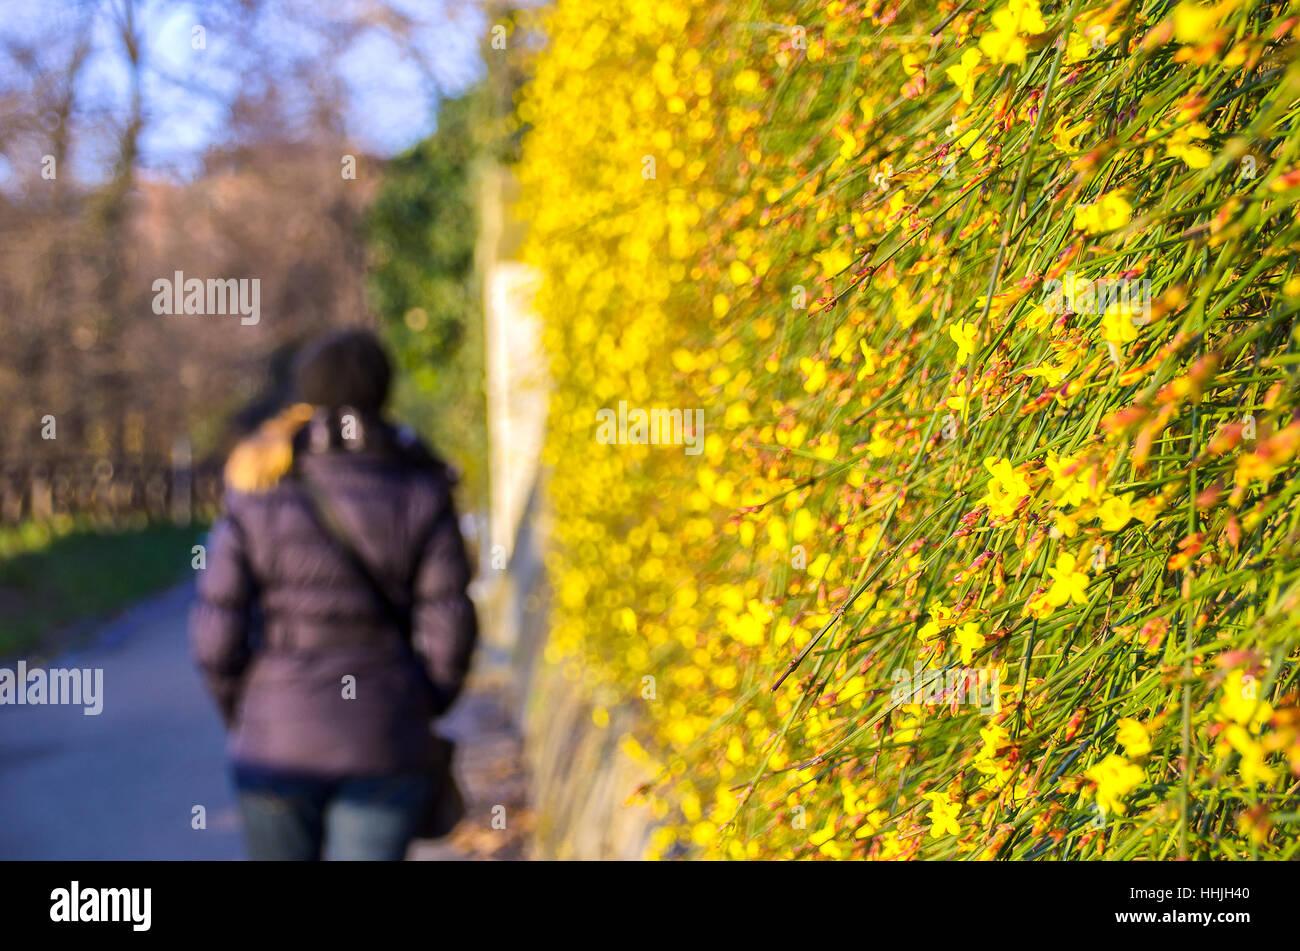 winter end flower bloom spring arrival woman walk back blurred background winter jasmine - Stock Image